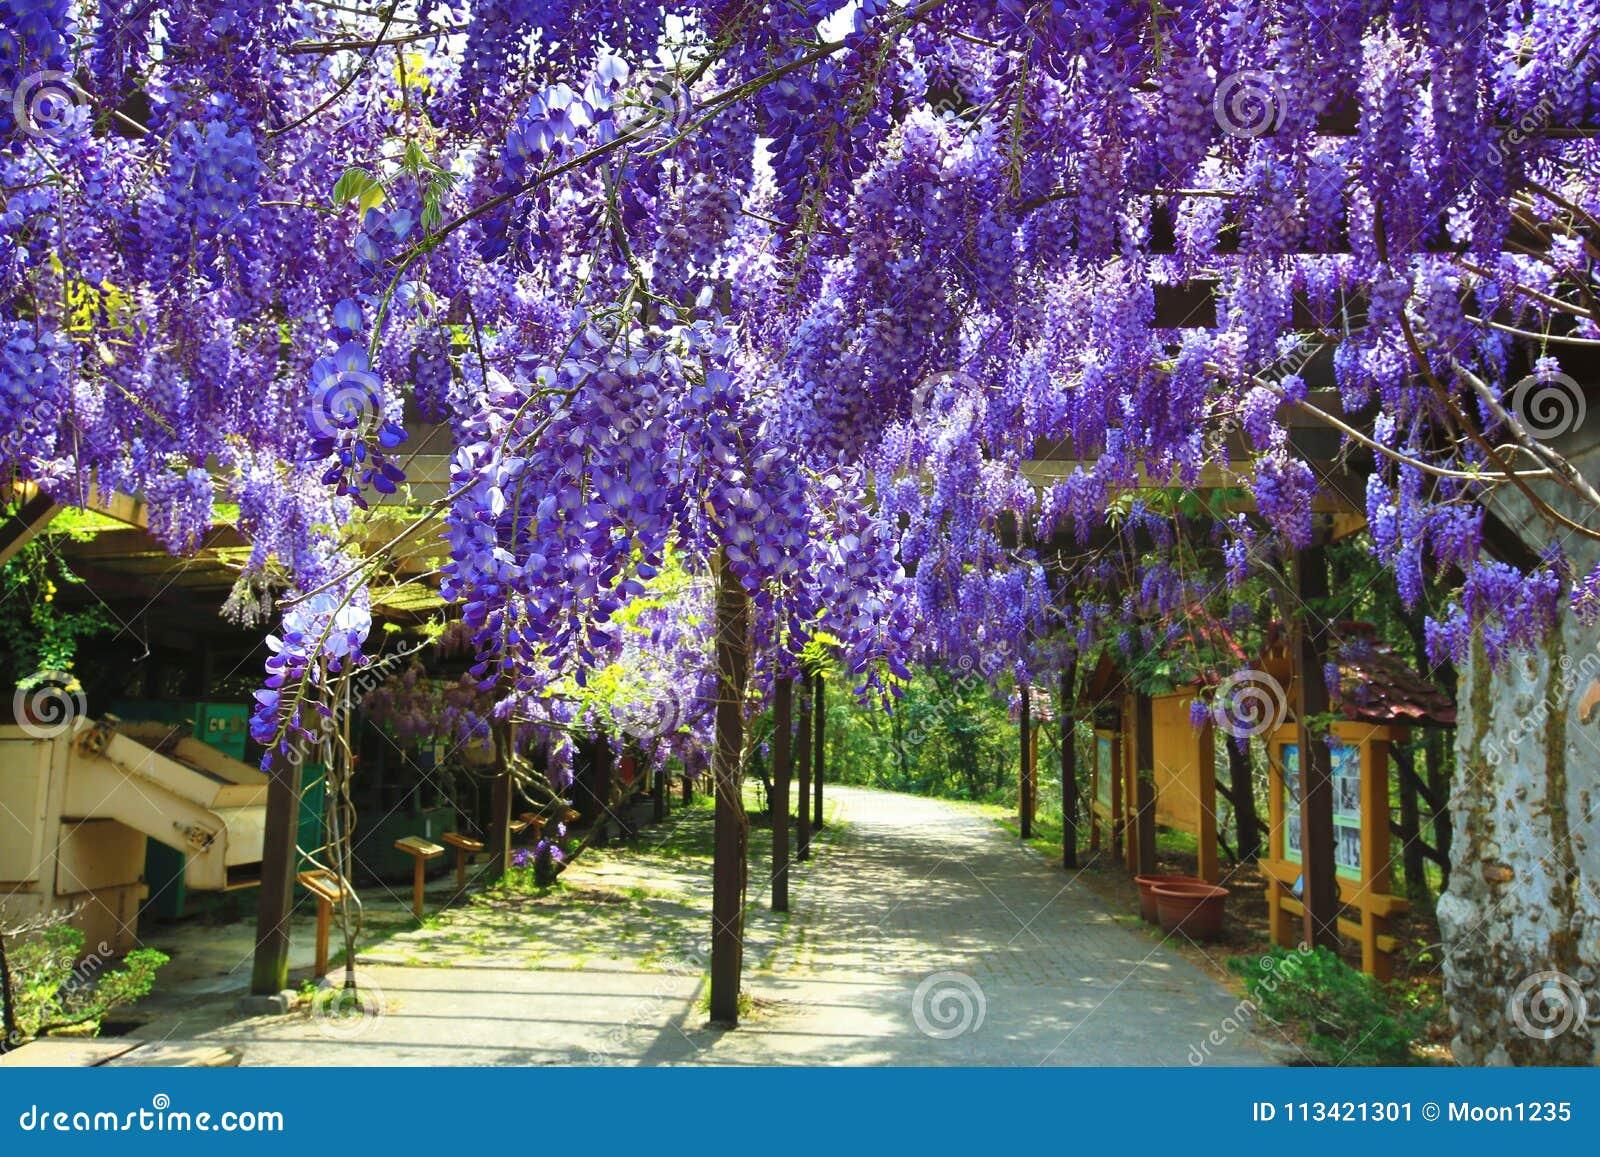 Purple wisteria flowersbean treechinese wisteriapurple vine stock purple wisteria flowersbeautiful scenery of purple with yellow flowers and buds blooming in the garden in springbean treechinese wisteriapurple vine mightylinksfo